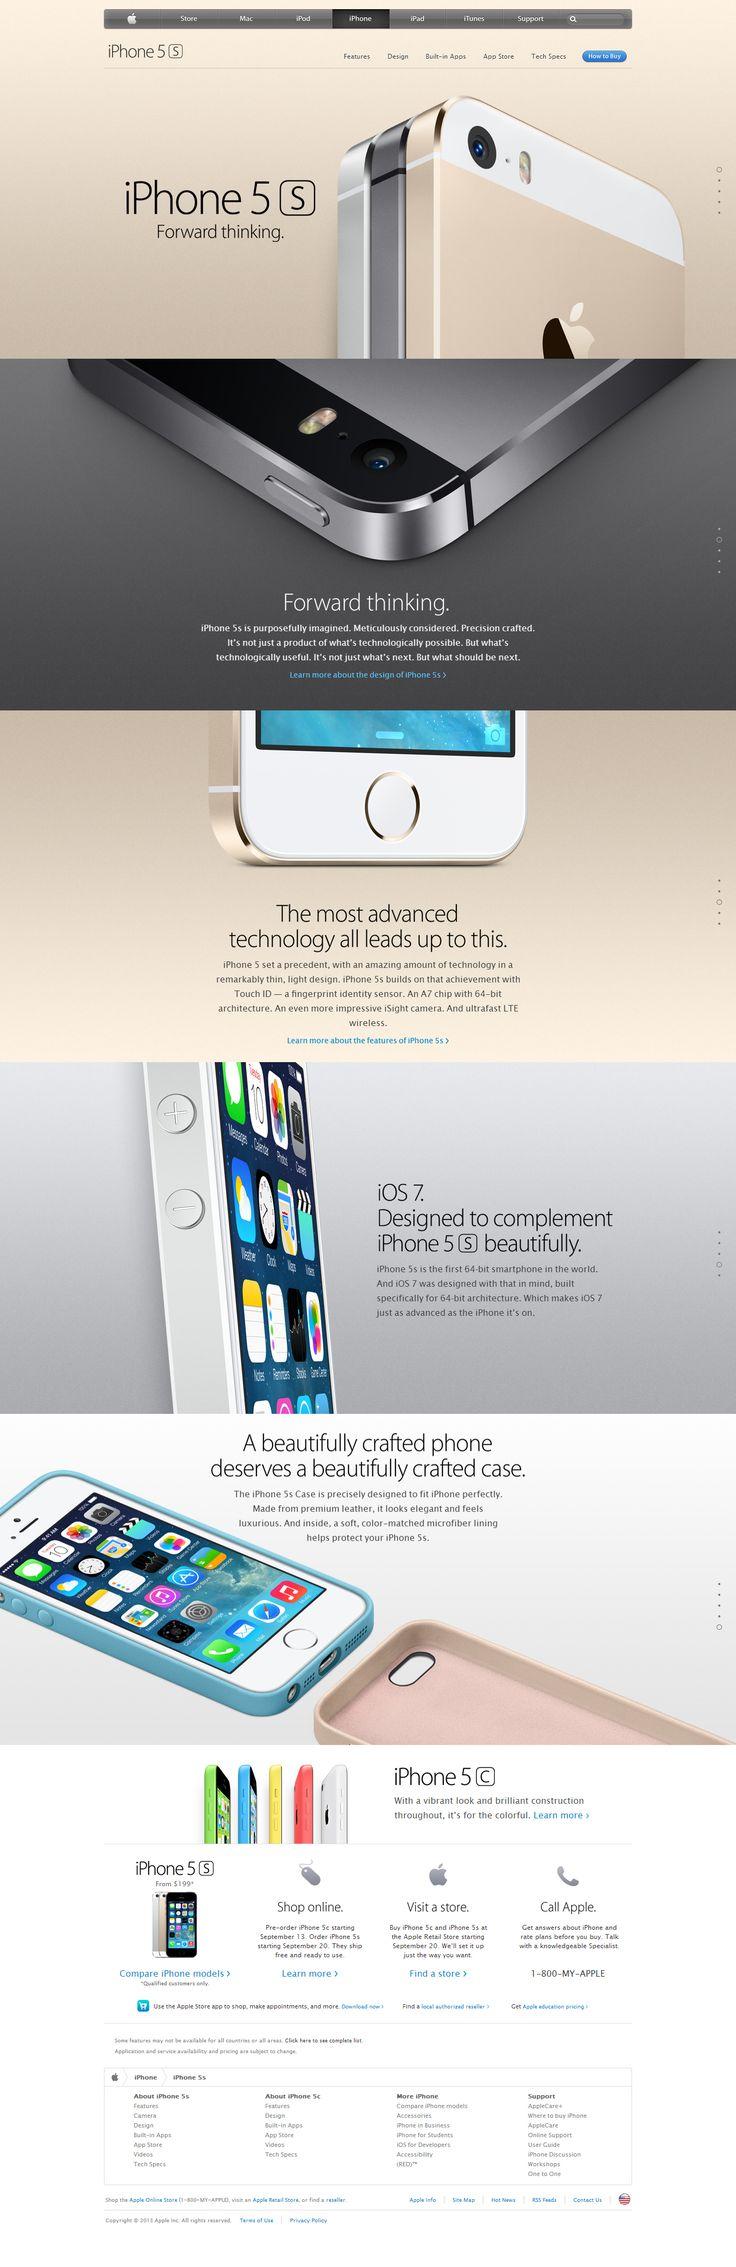 iPhone 5s - #iphone5s #apple #webdesign